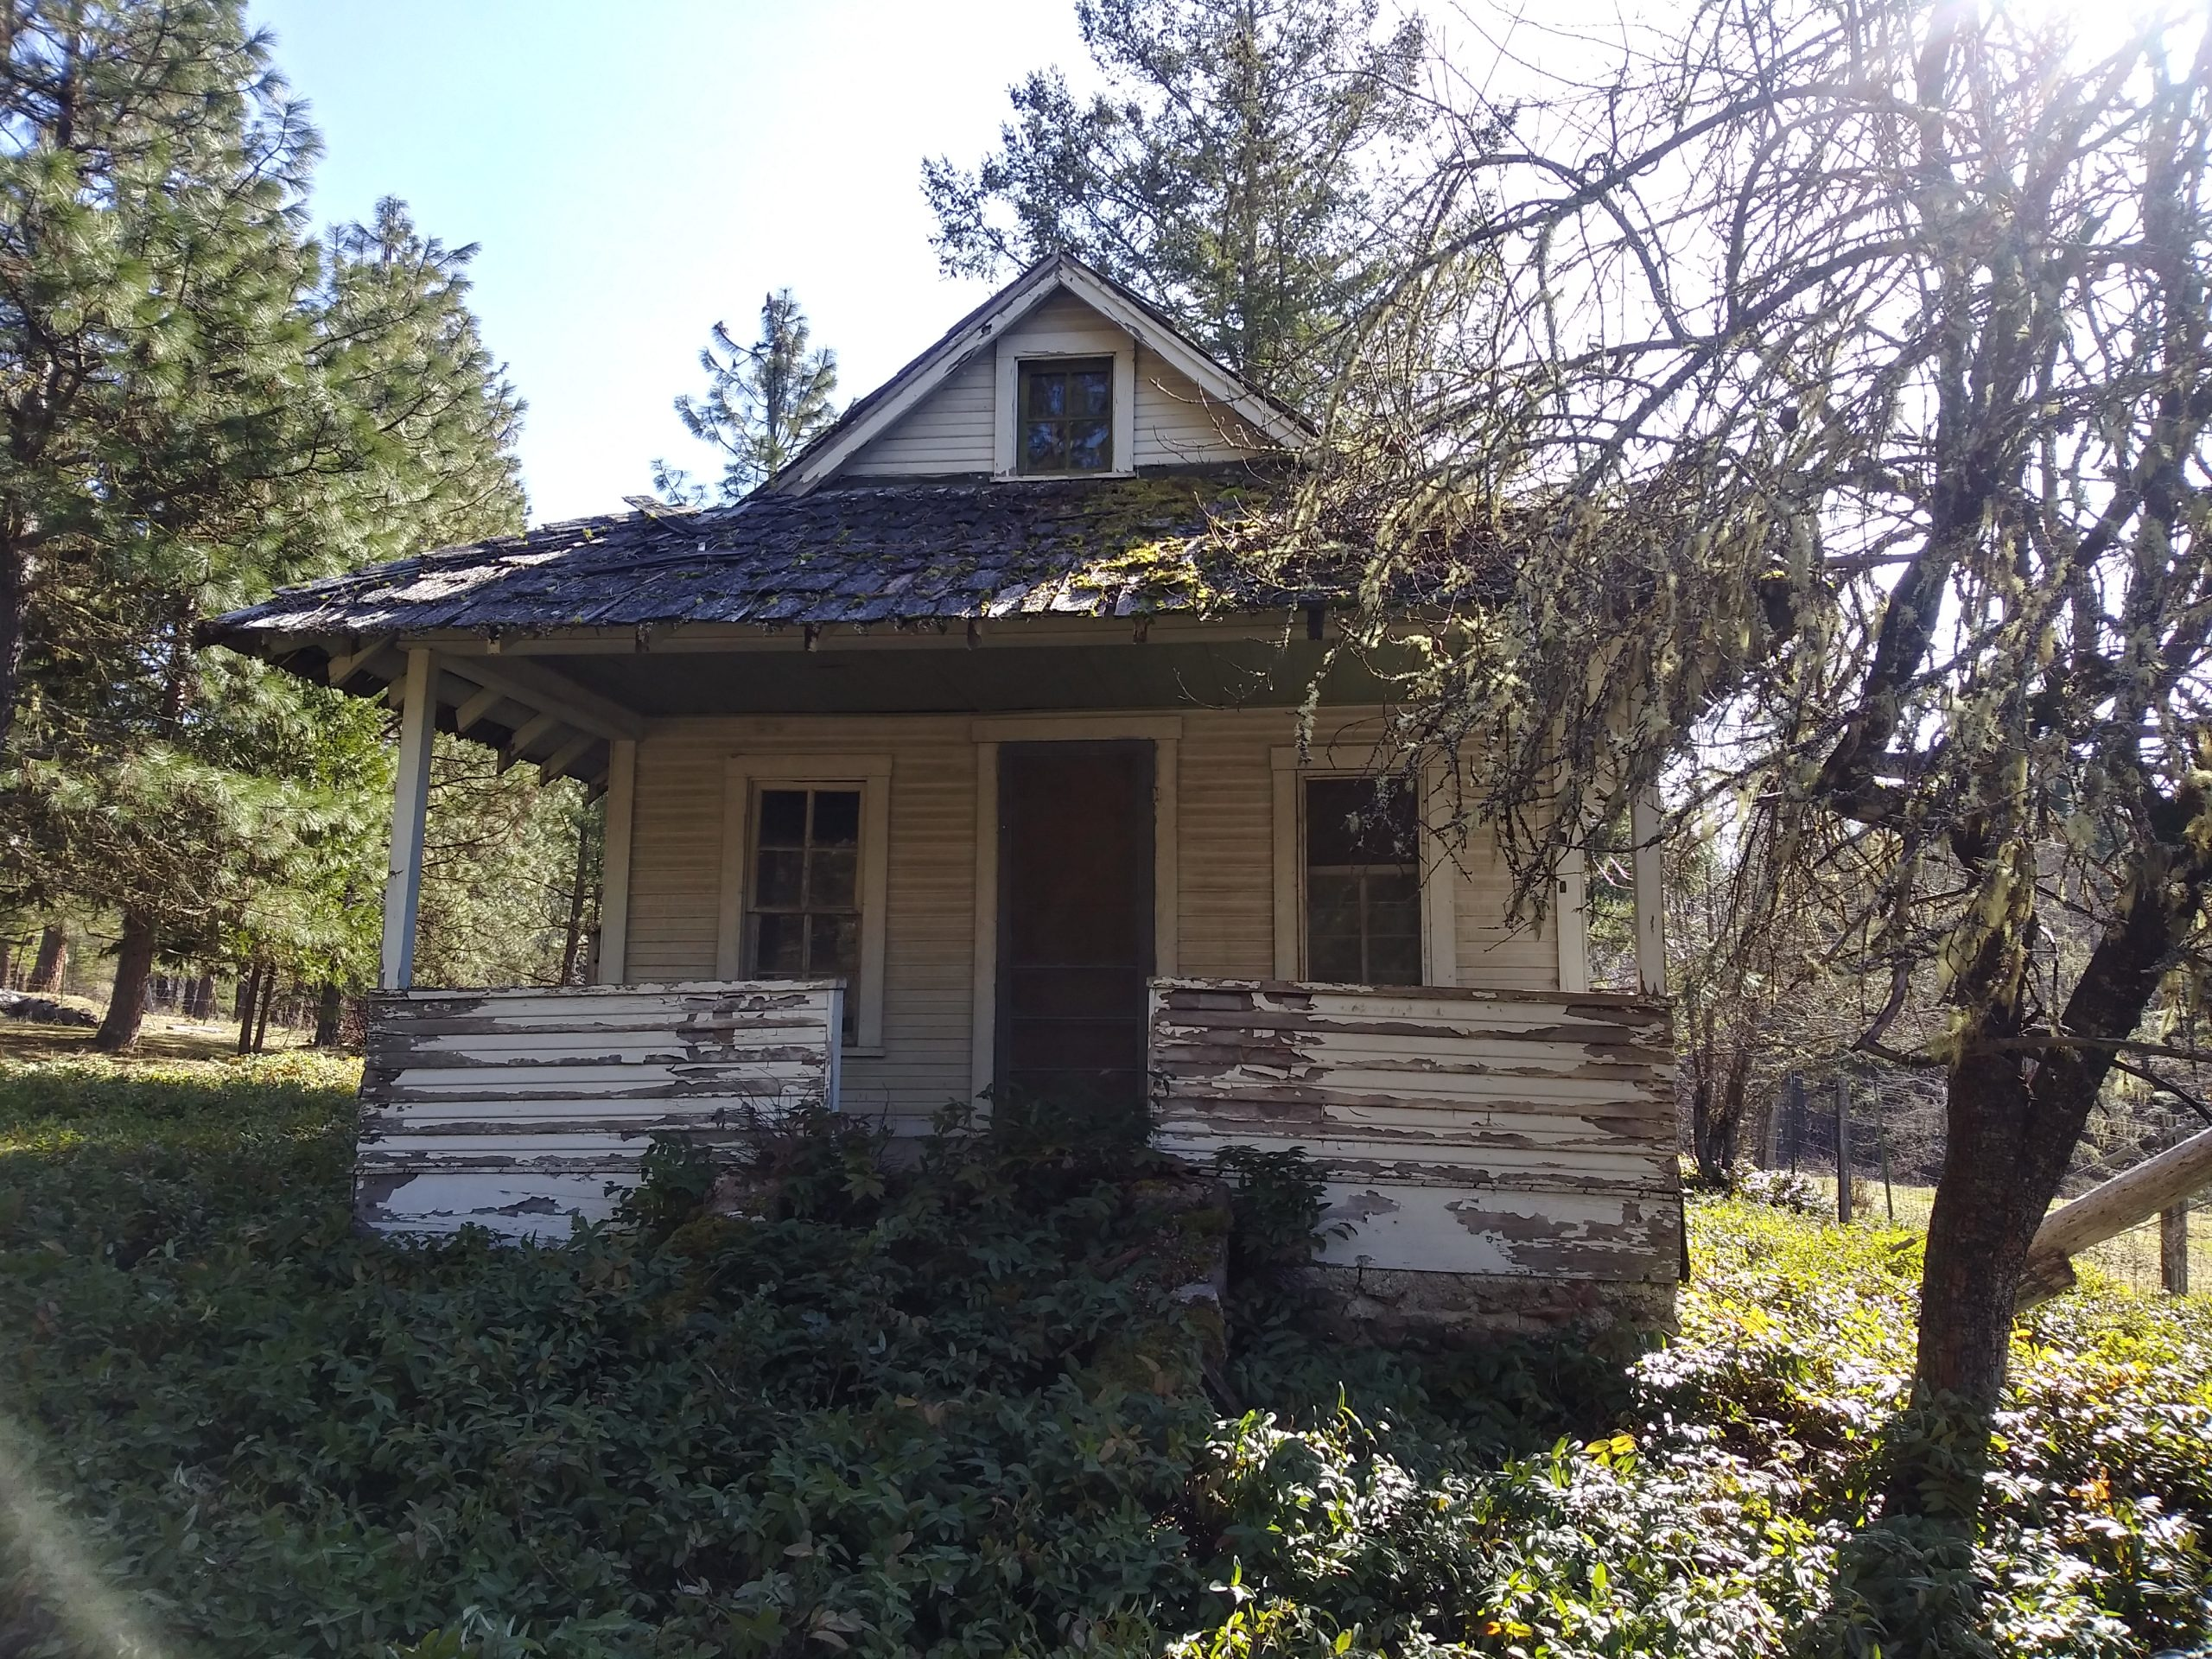 Mathews Guard Station, OR 2021